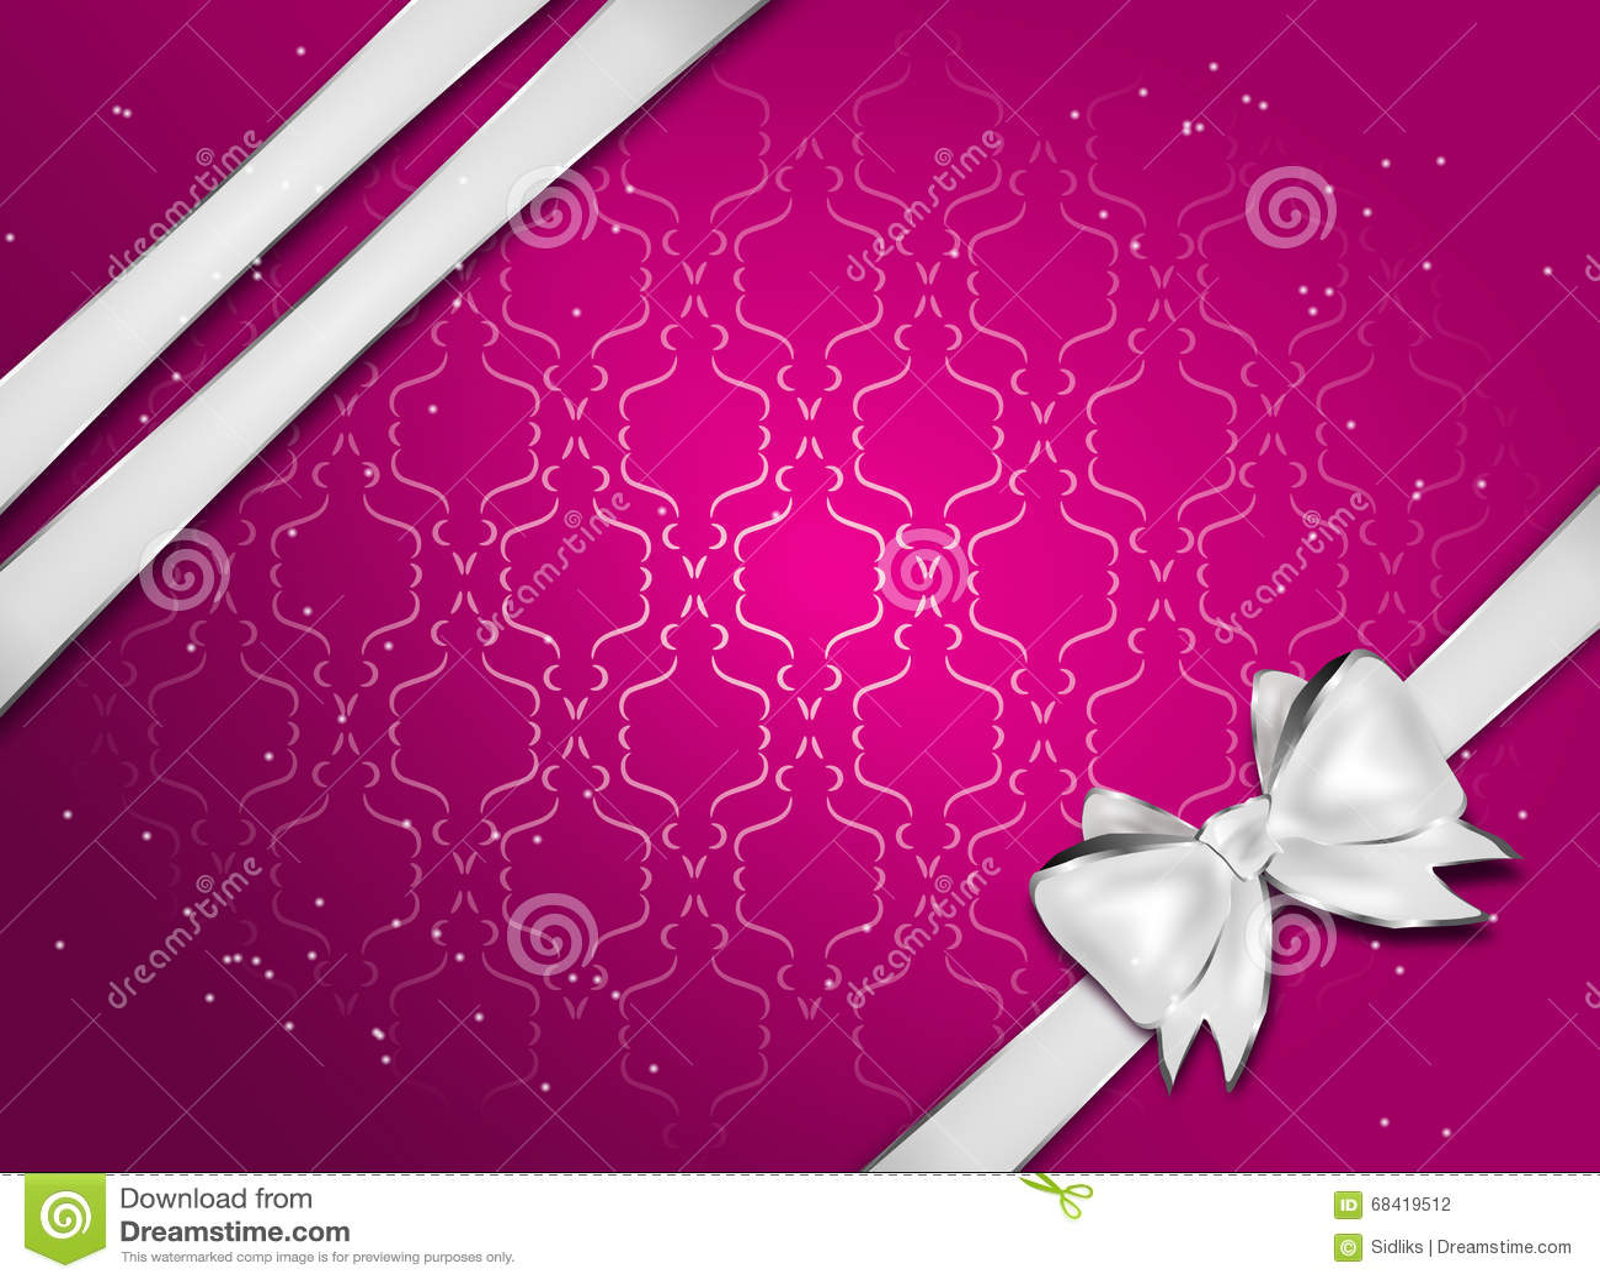 pink greeting card stock illustration  illustration of